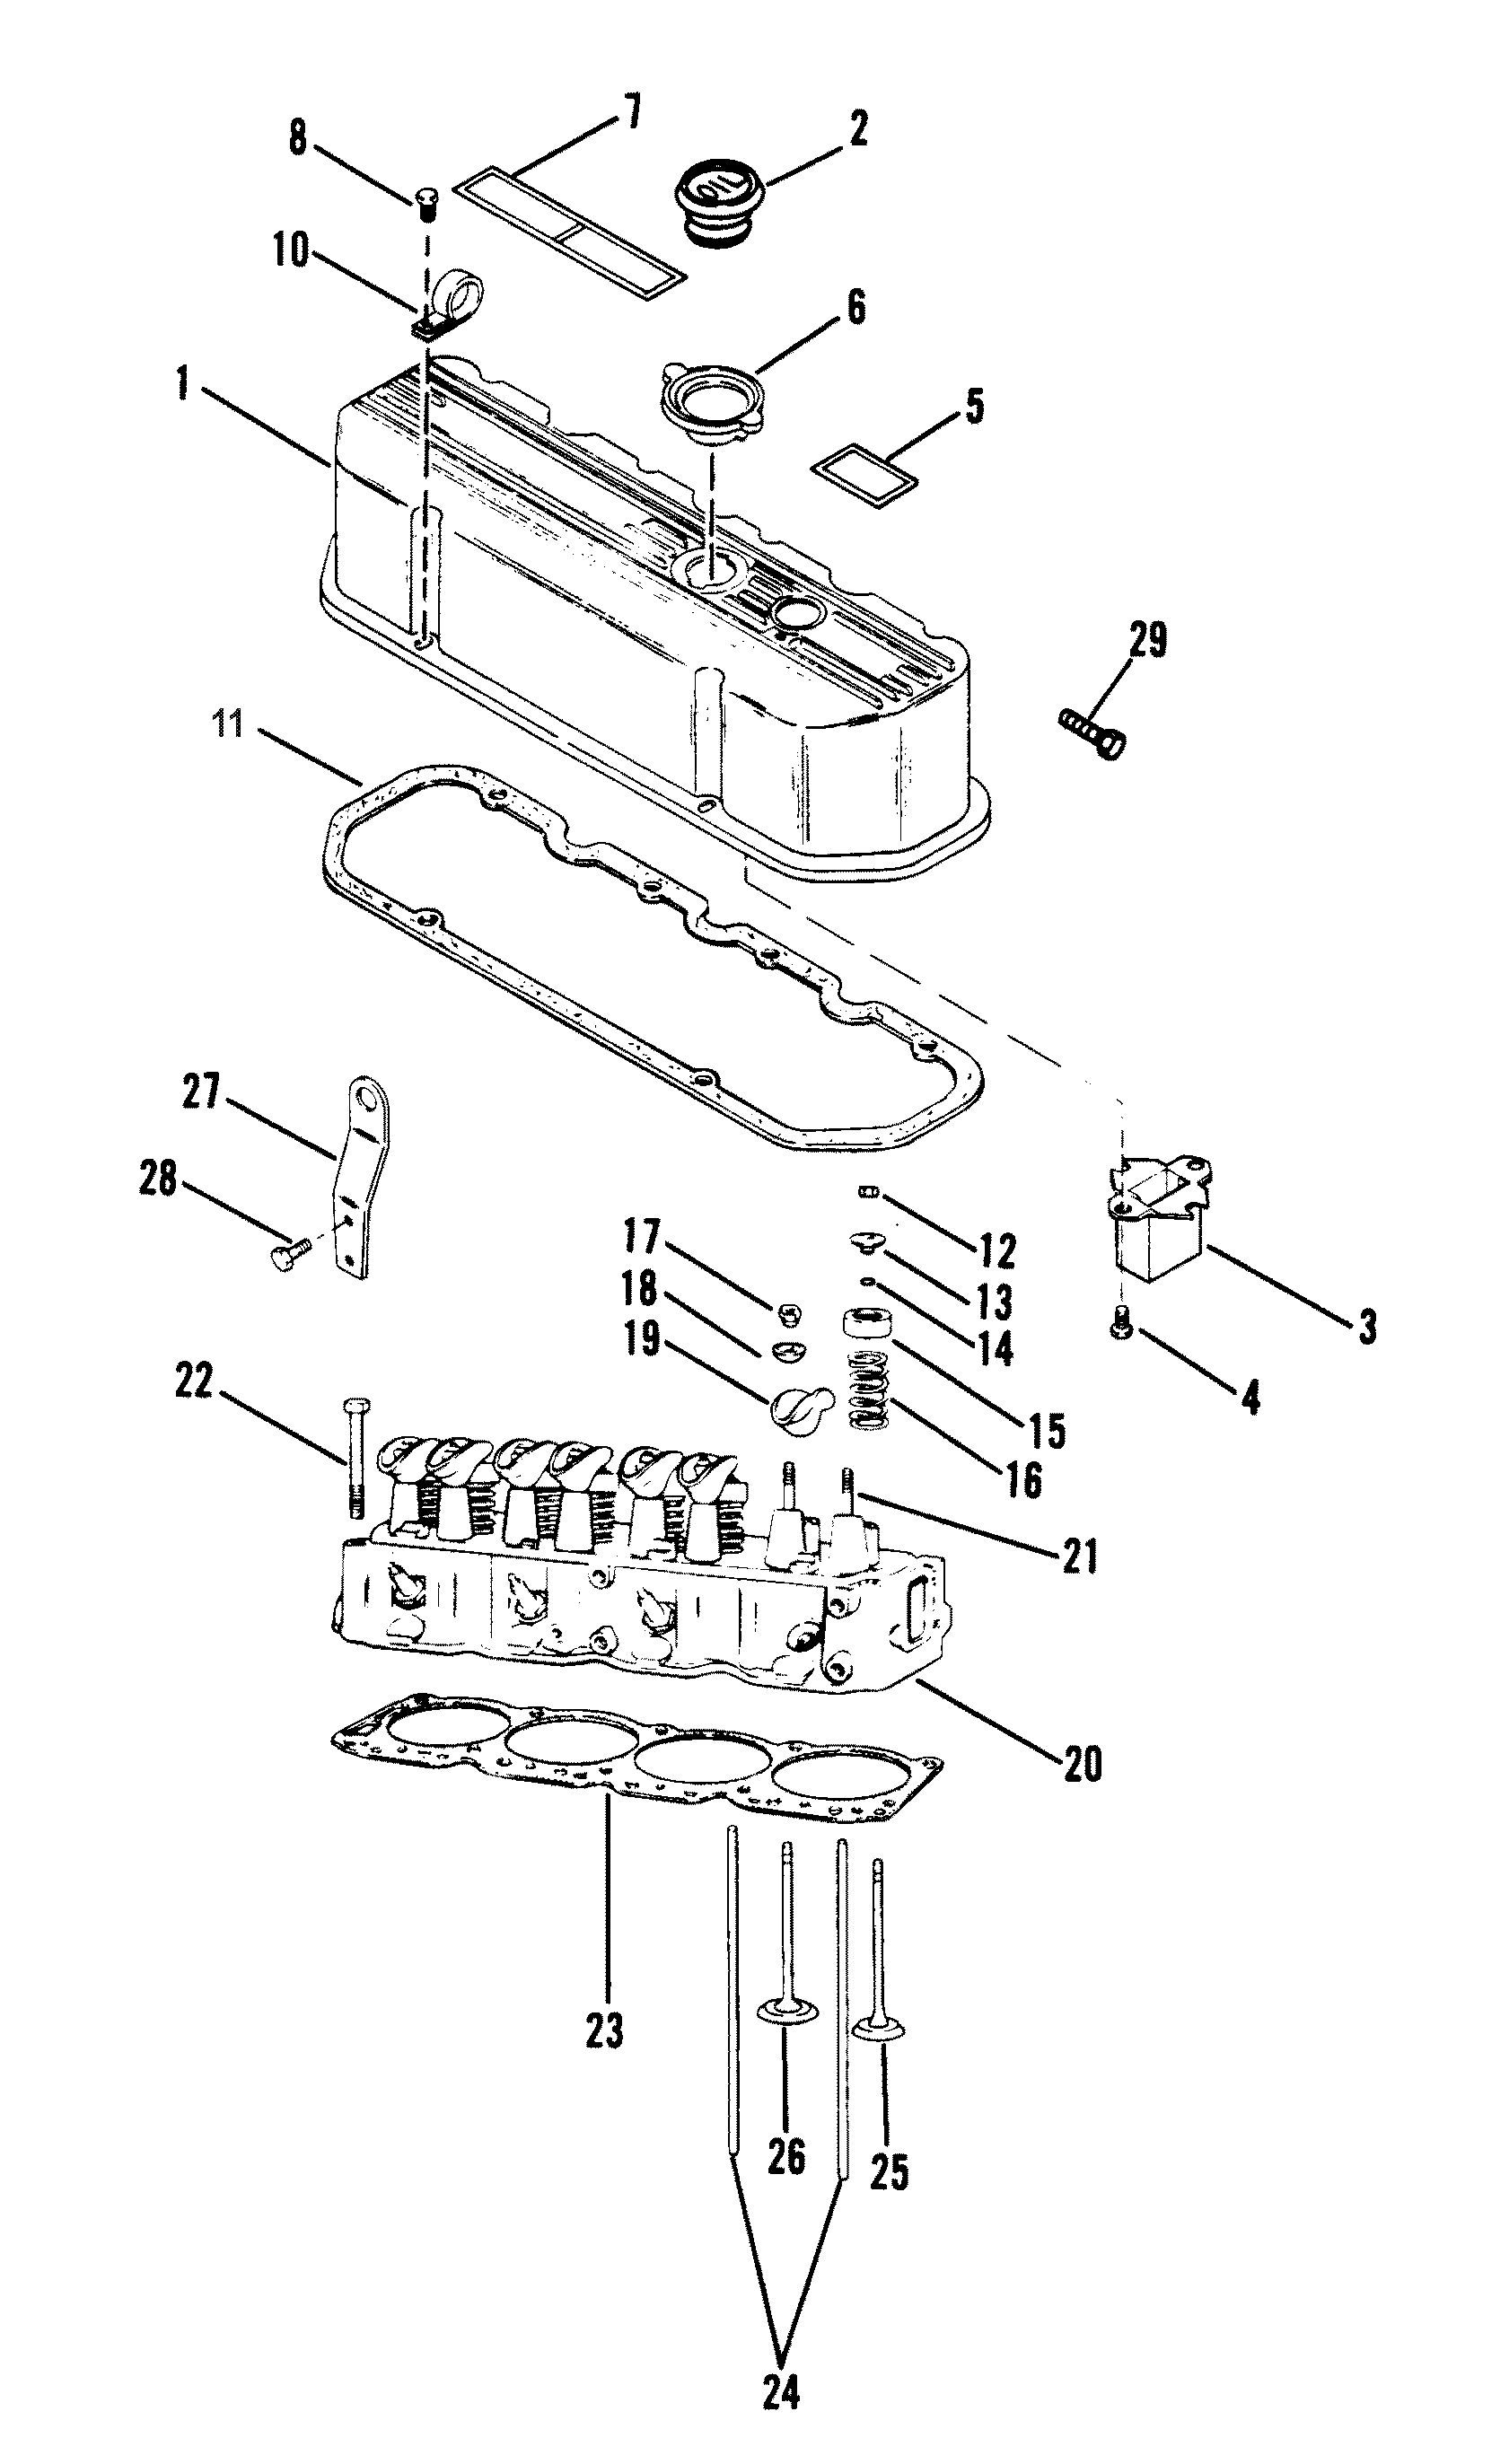 cylinder head and rocker cover 140 181 cid for mercruiser 120 h p   2 5l140 h p   3 0l r  mr  alpha